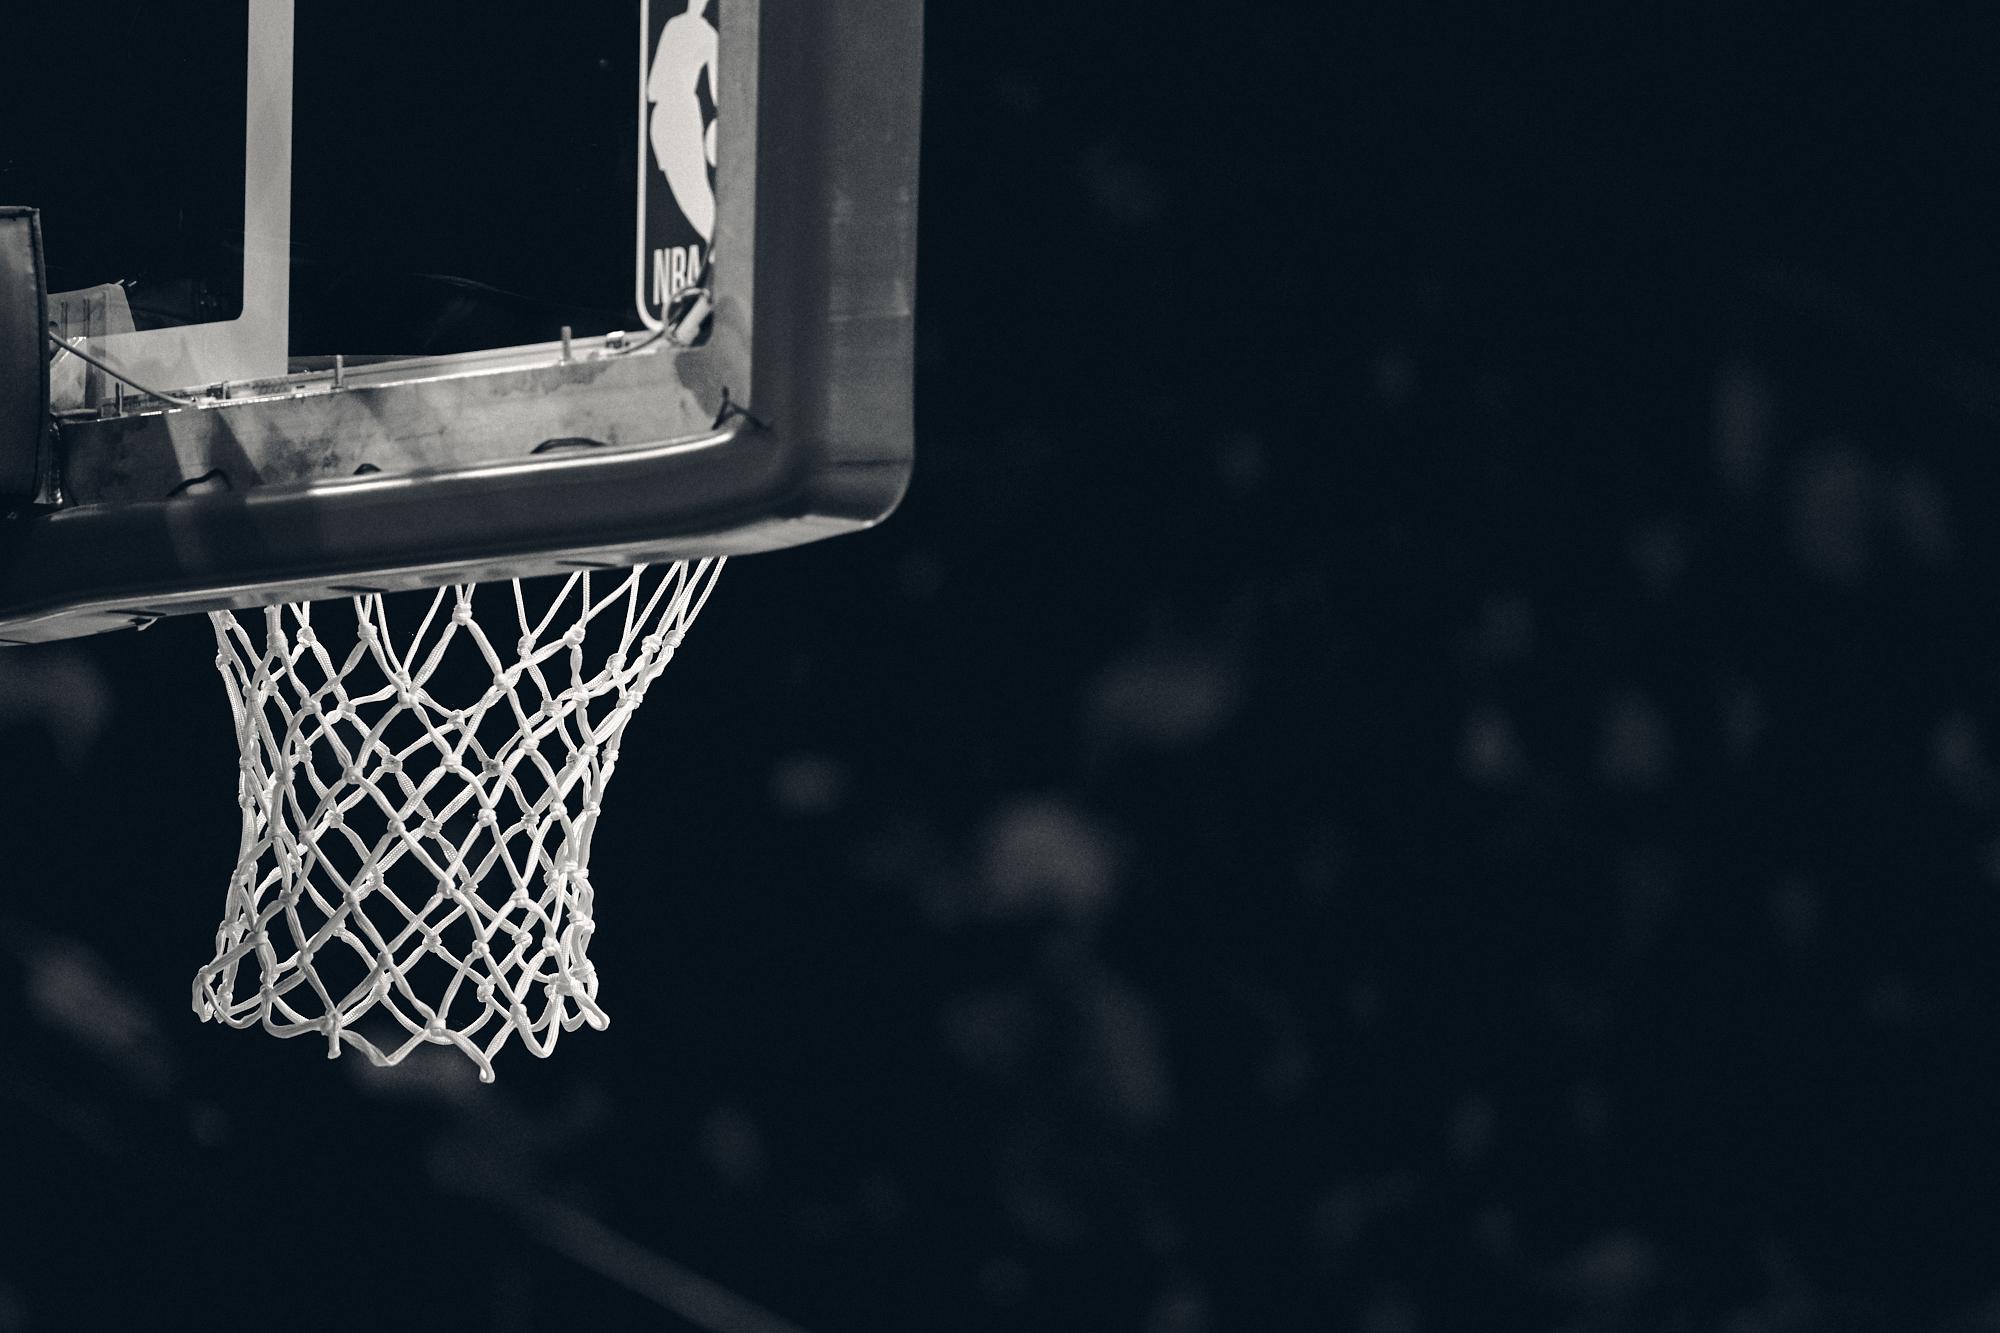 Brooklyn Nets vs New York Knicks - December 8th, 2018